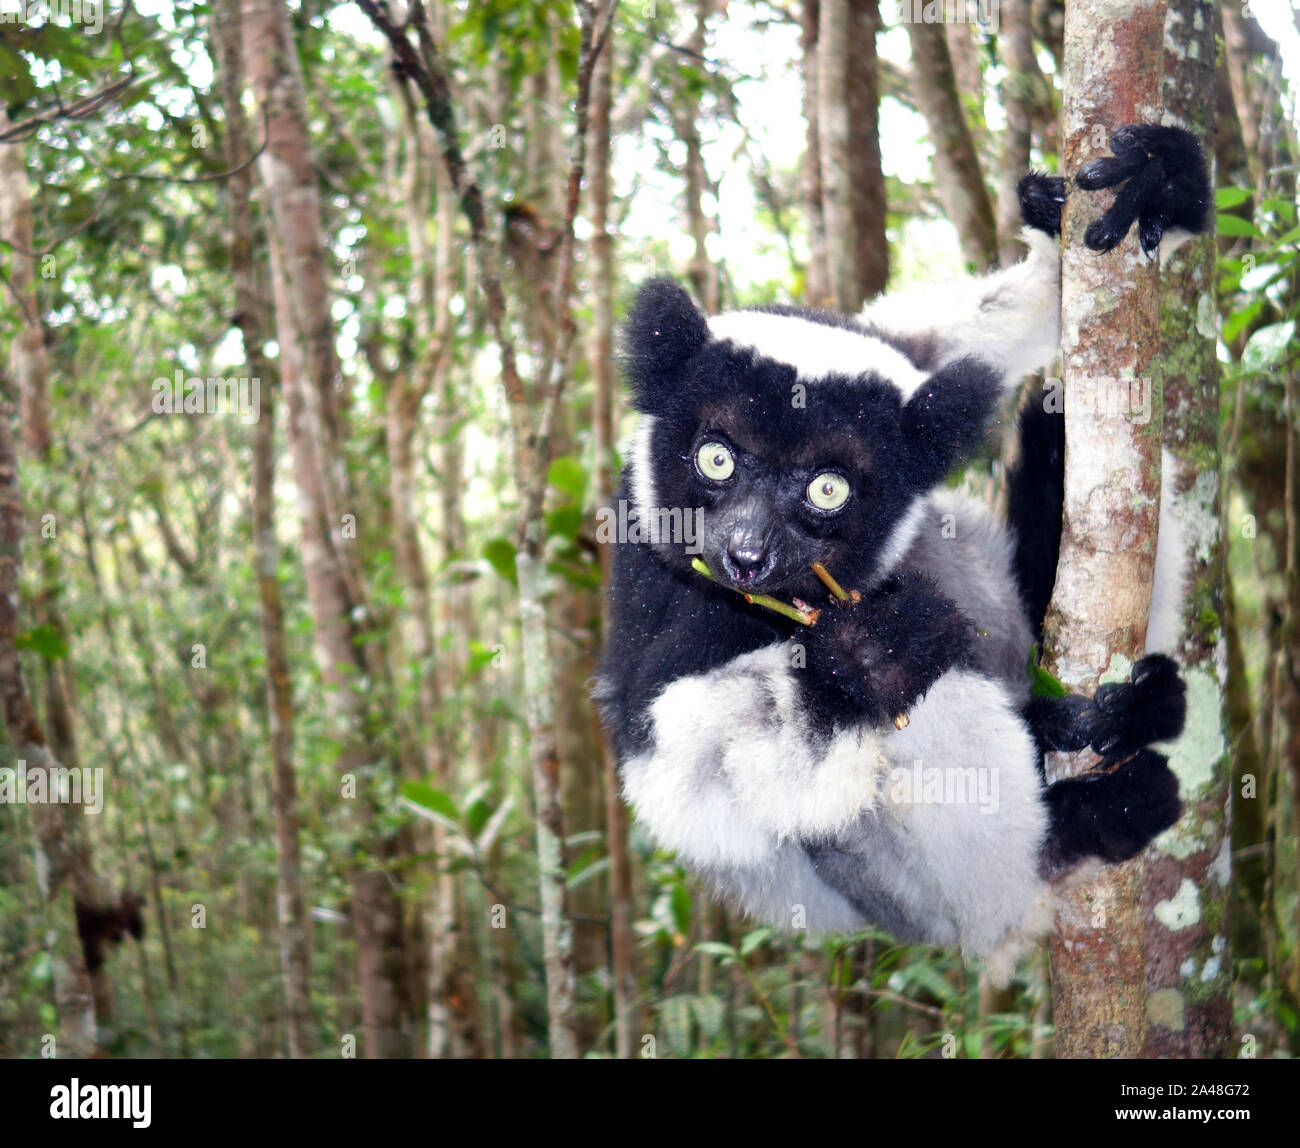 Wild Indri lemur (Indri indri), Parc Mitsinjo, Andasibe, Madagascar Stock Photo